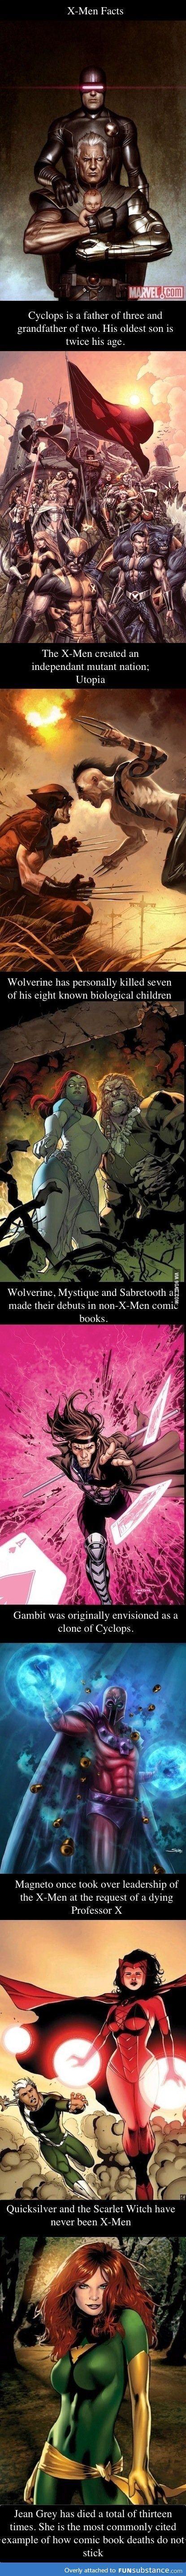 X-men facts compilation